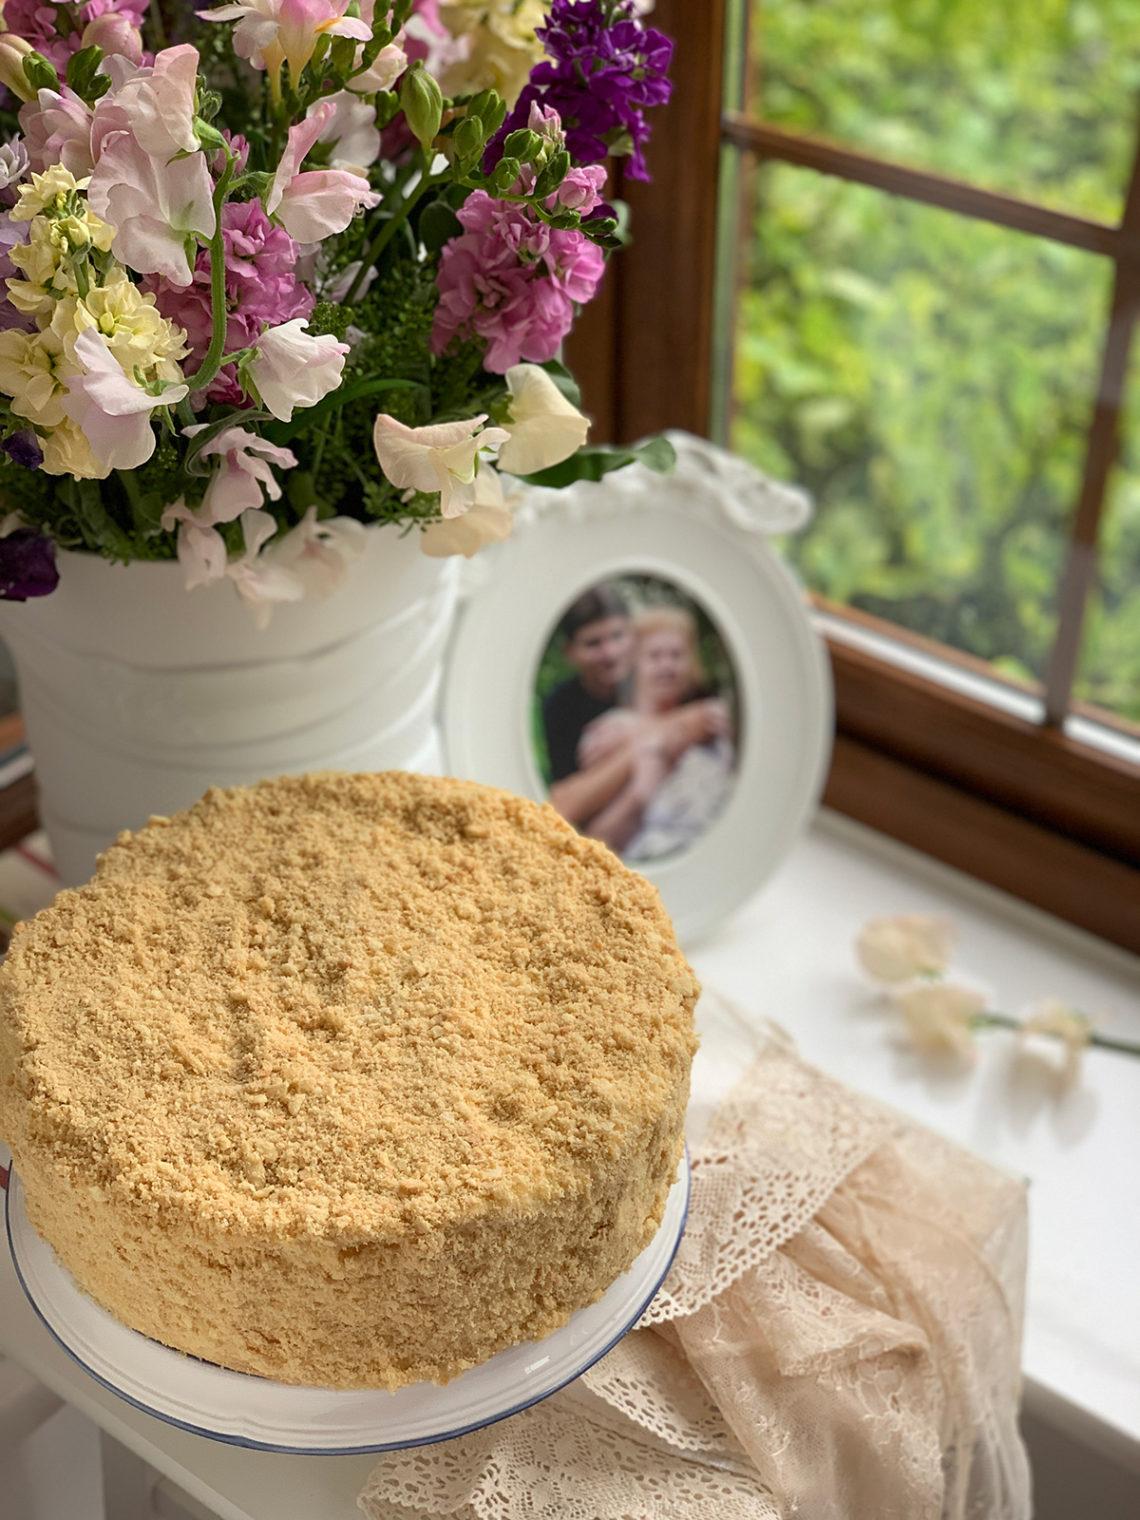 Odessa Napoleon cake. Best food photos and recipes in Maria Kalenska blog